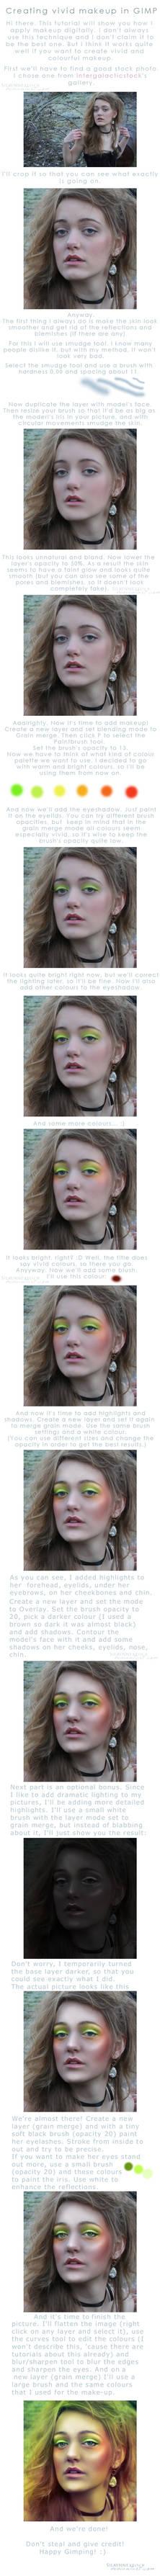 Creating Vivid Makeup:Tutorial